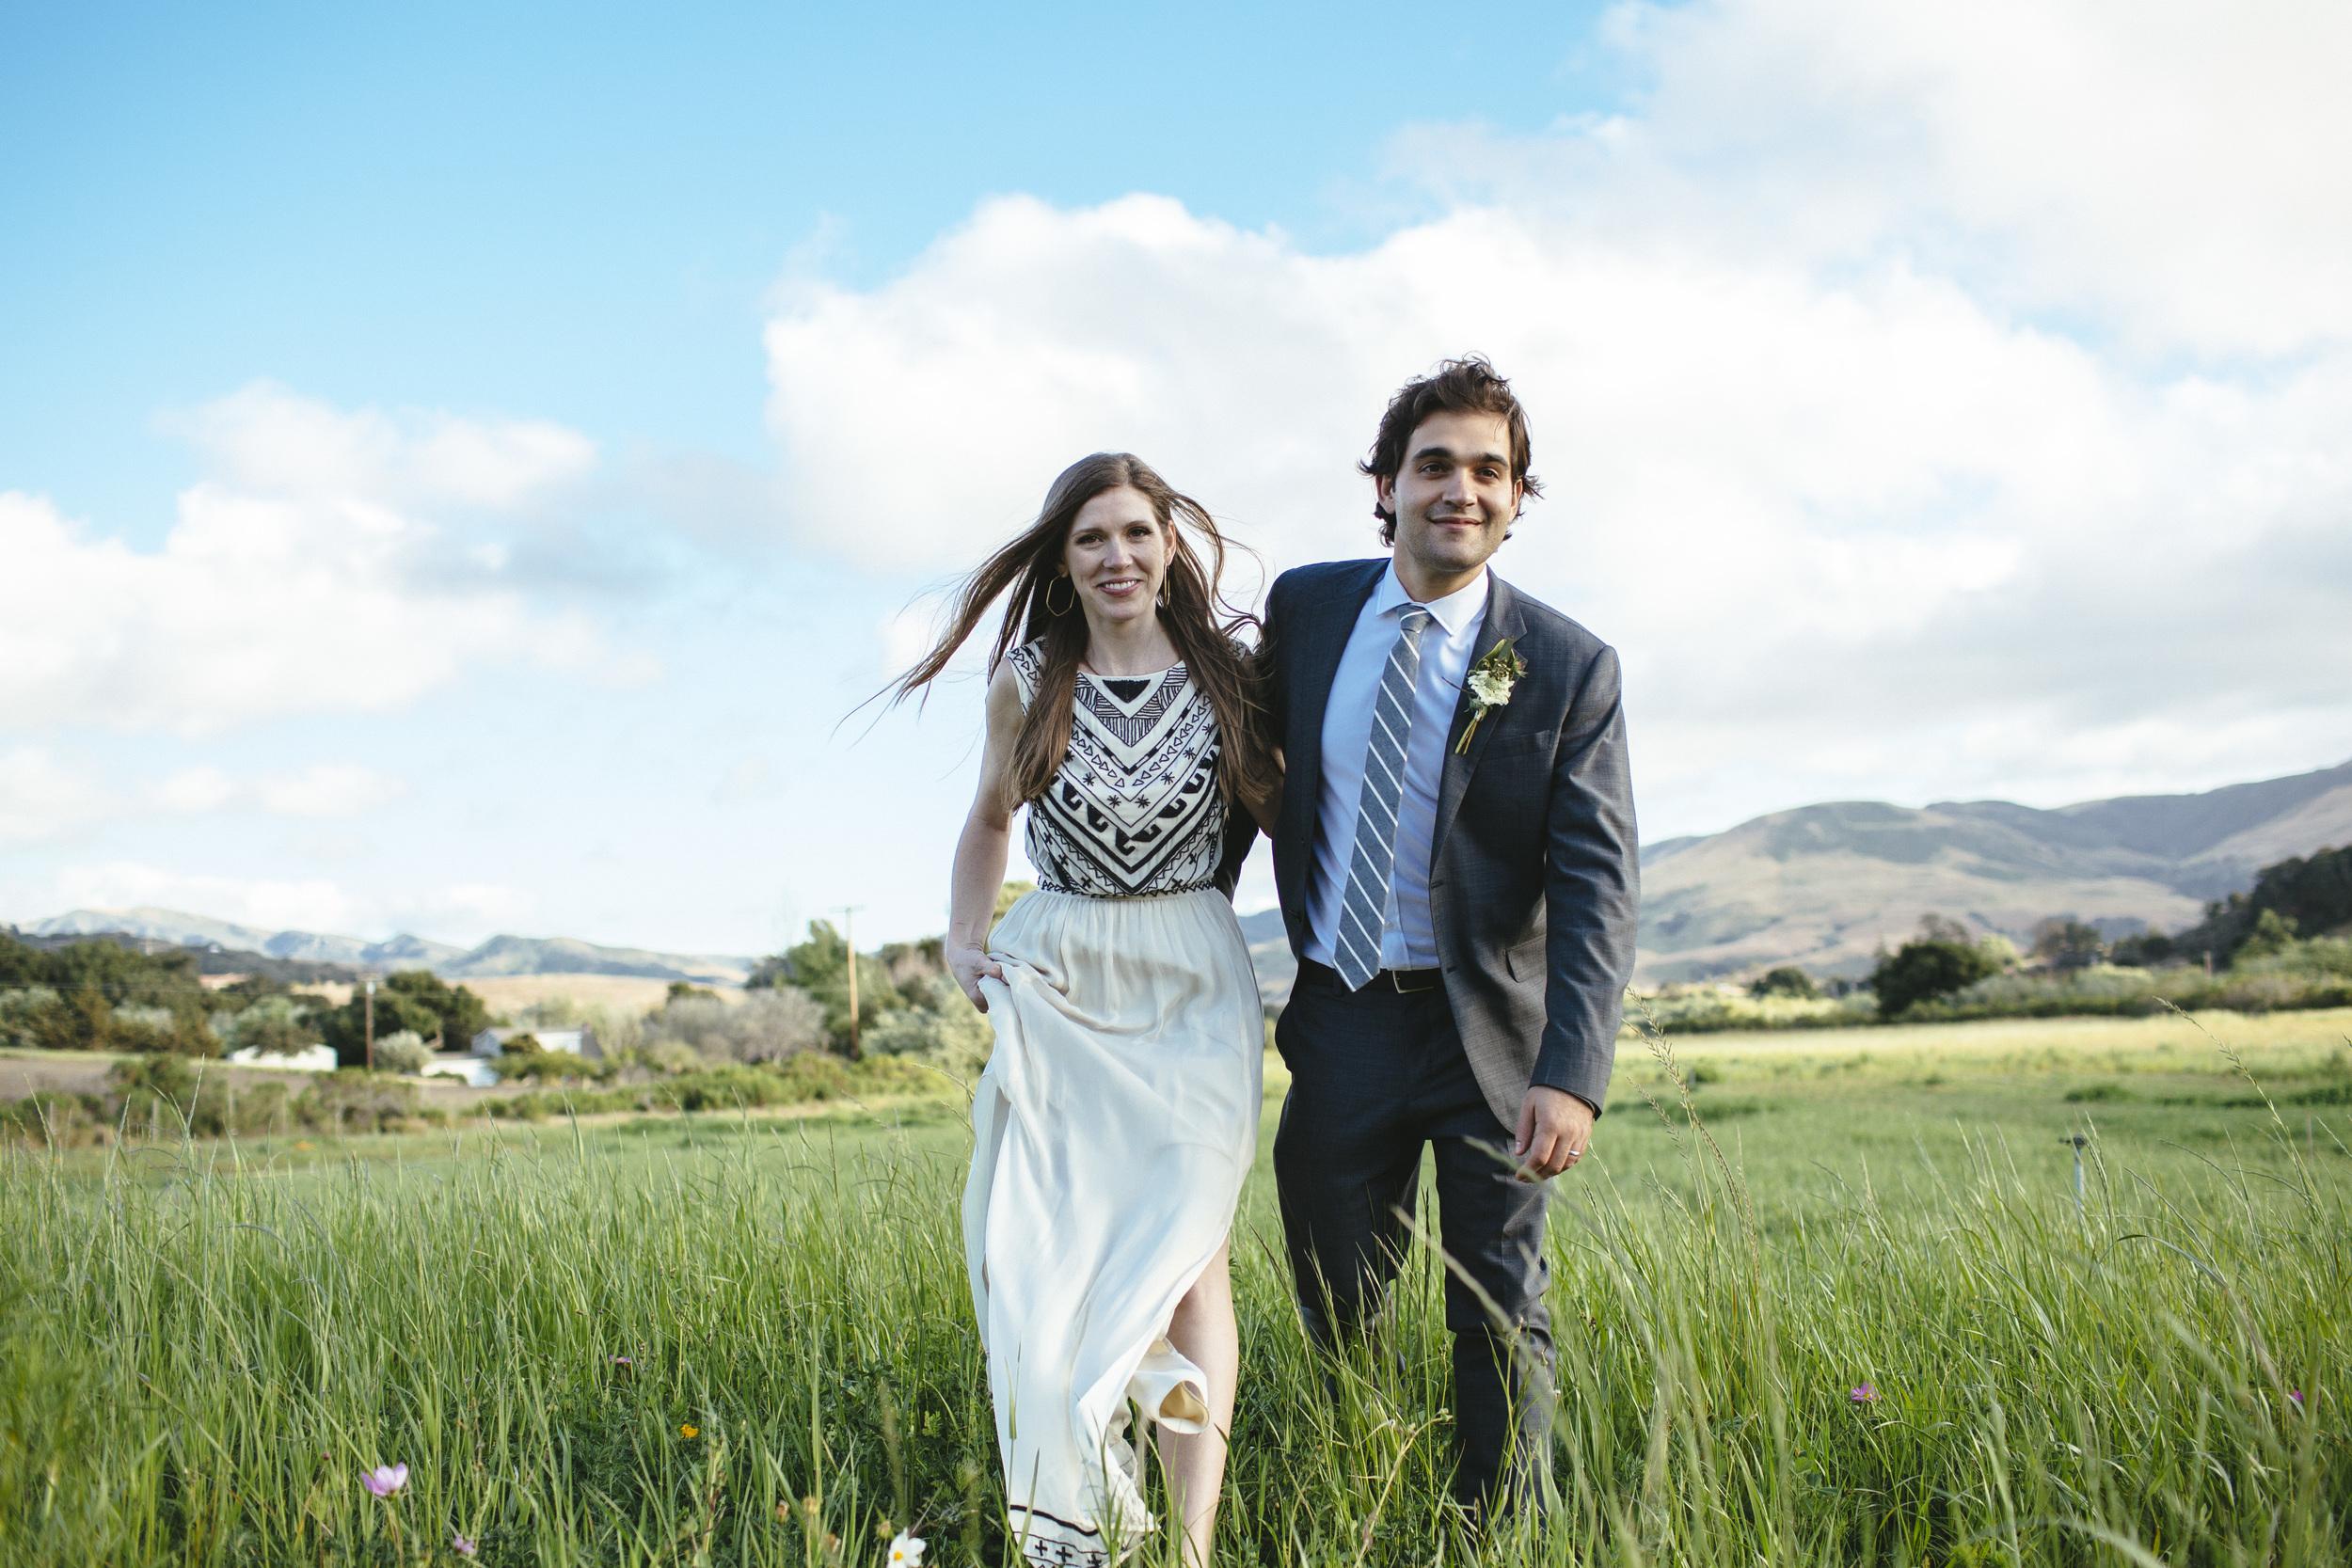 apple-creek-ranch-wedding-alegria-by-design-coordination-planning-rustic-free-people (21).jpg